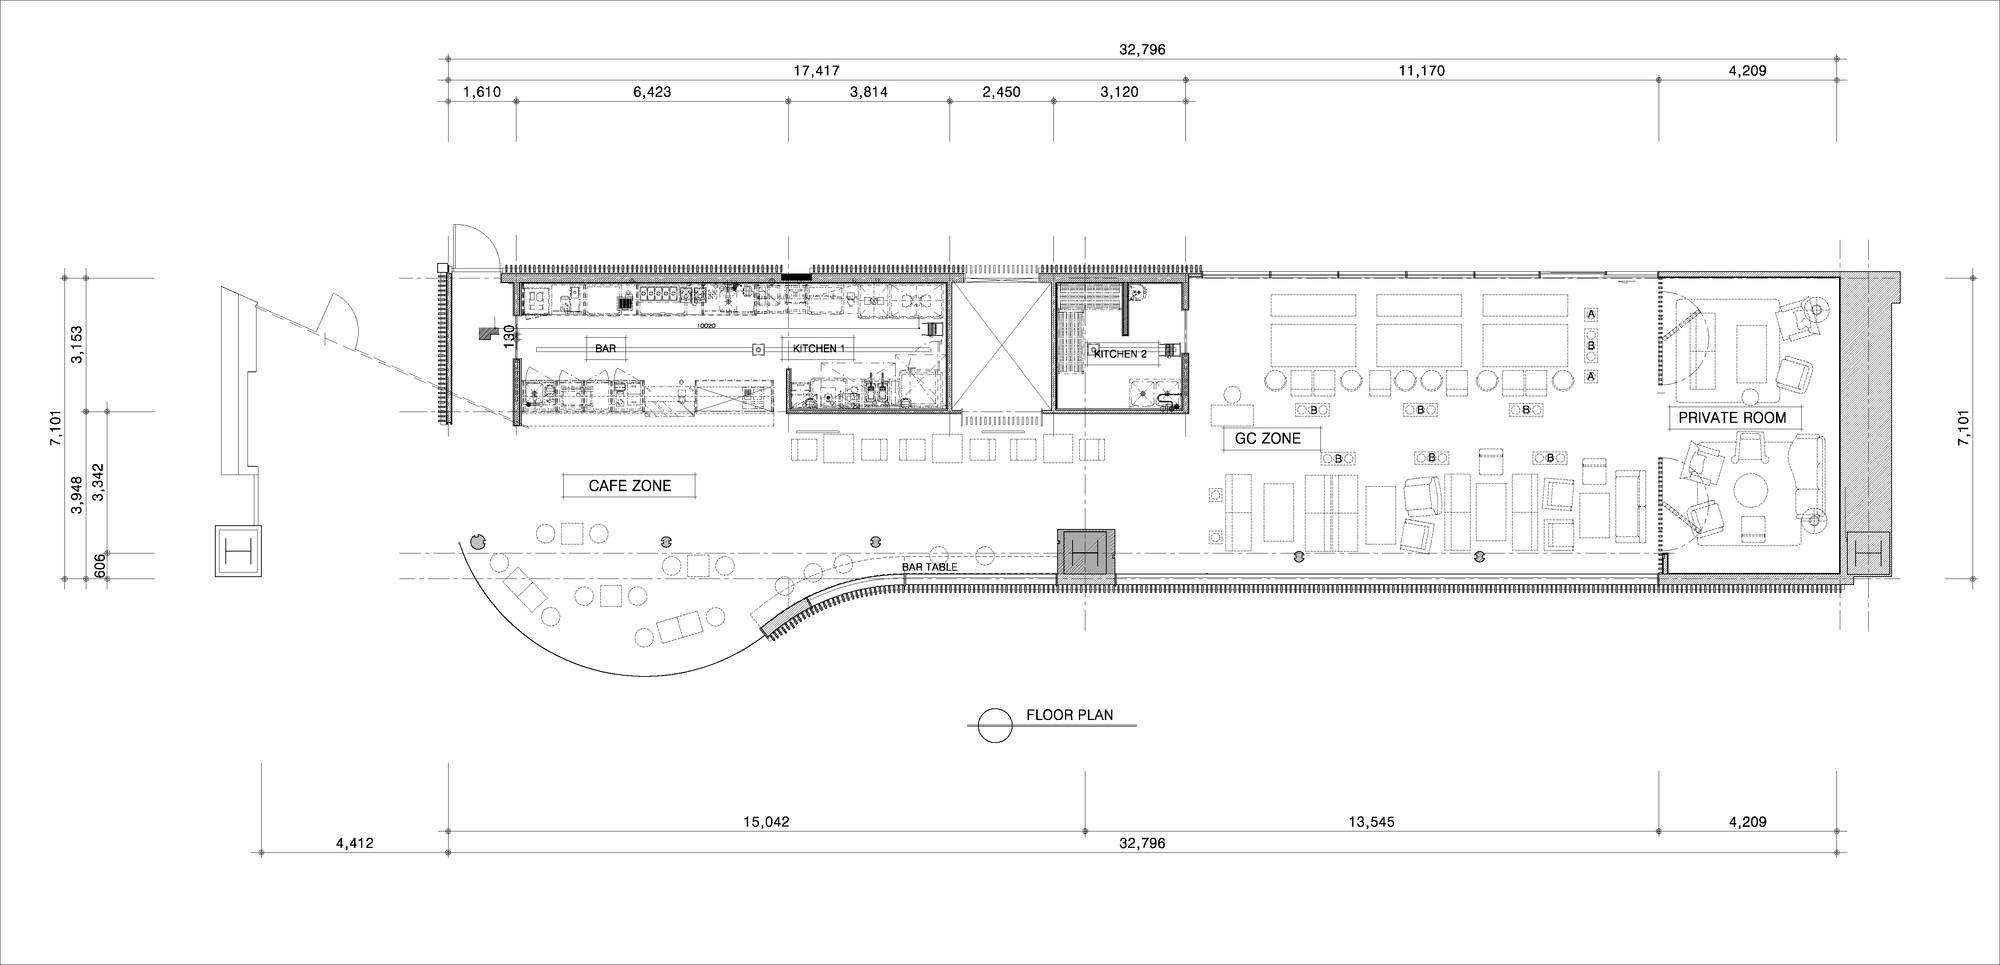 CGV Gold Class Lounge / URBANTAINER. 8 / 12. floor plan